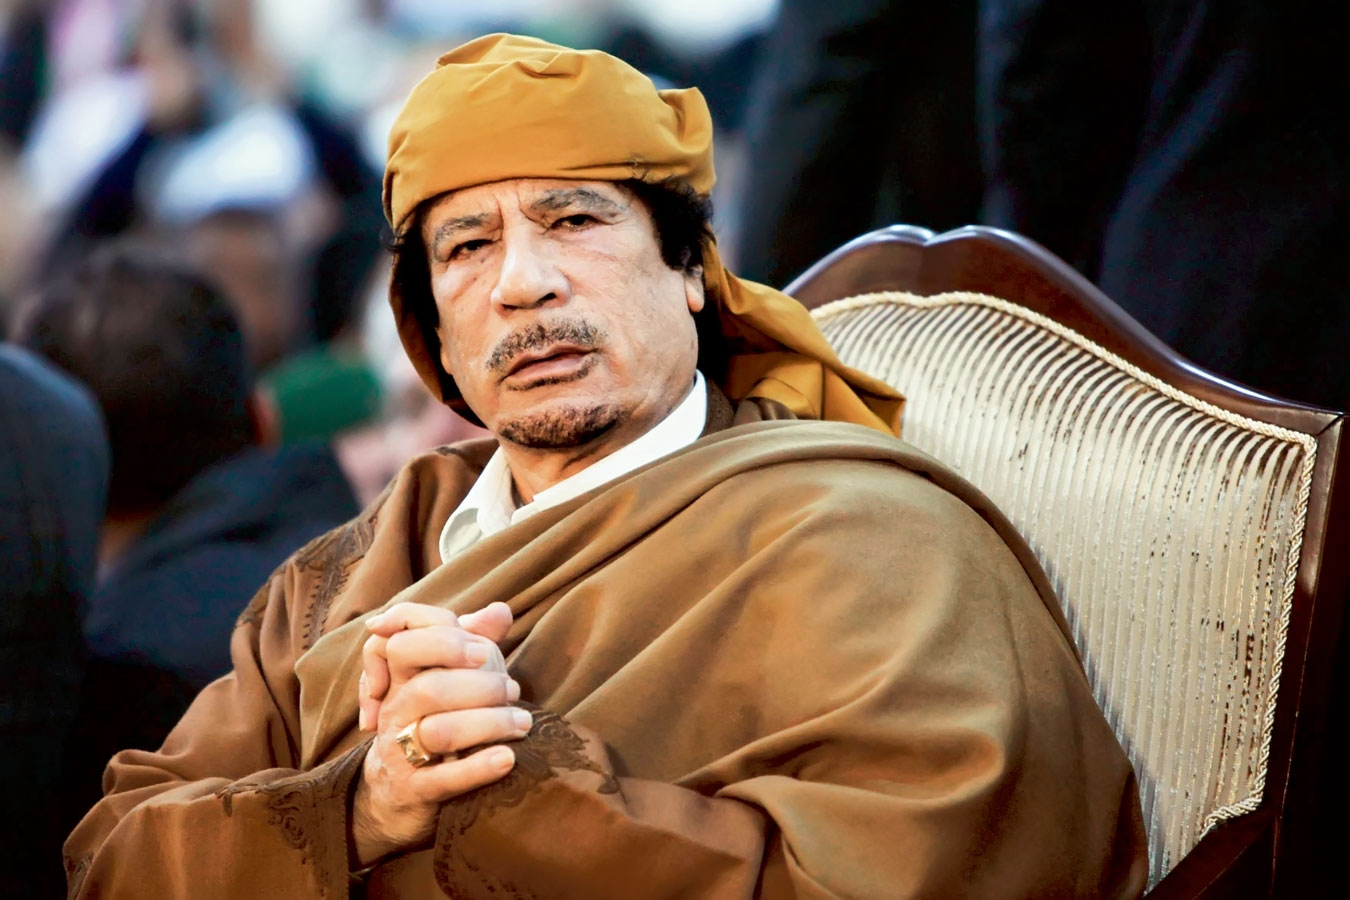 http://artyushenkooleg.ru/wp-oleg/wp-content/uploads/2016/09/gaddafi-1.jpg